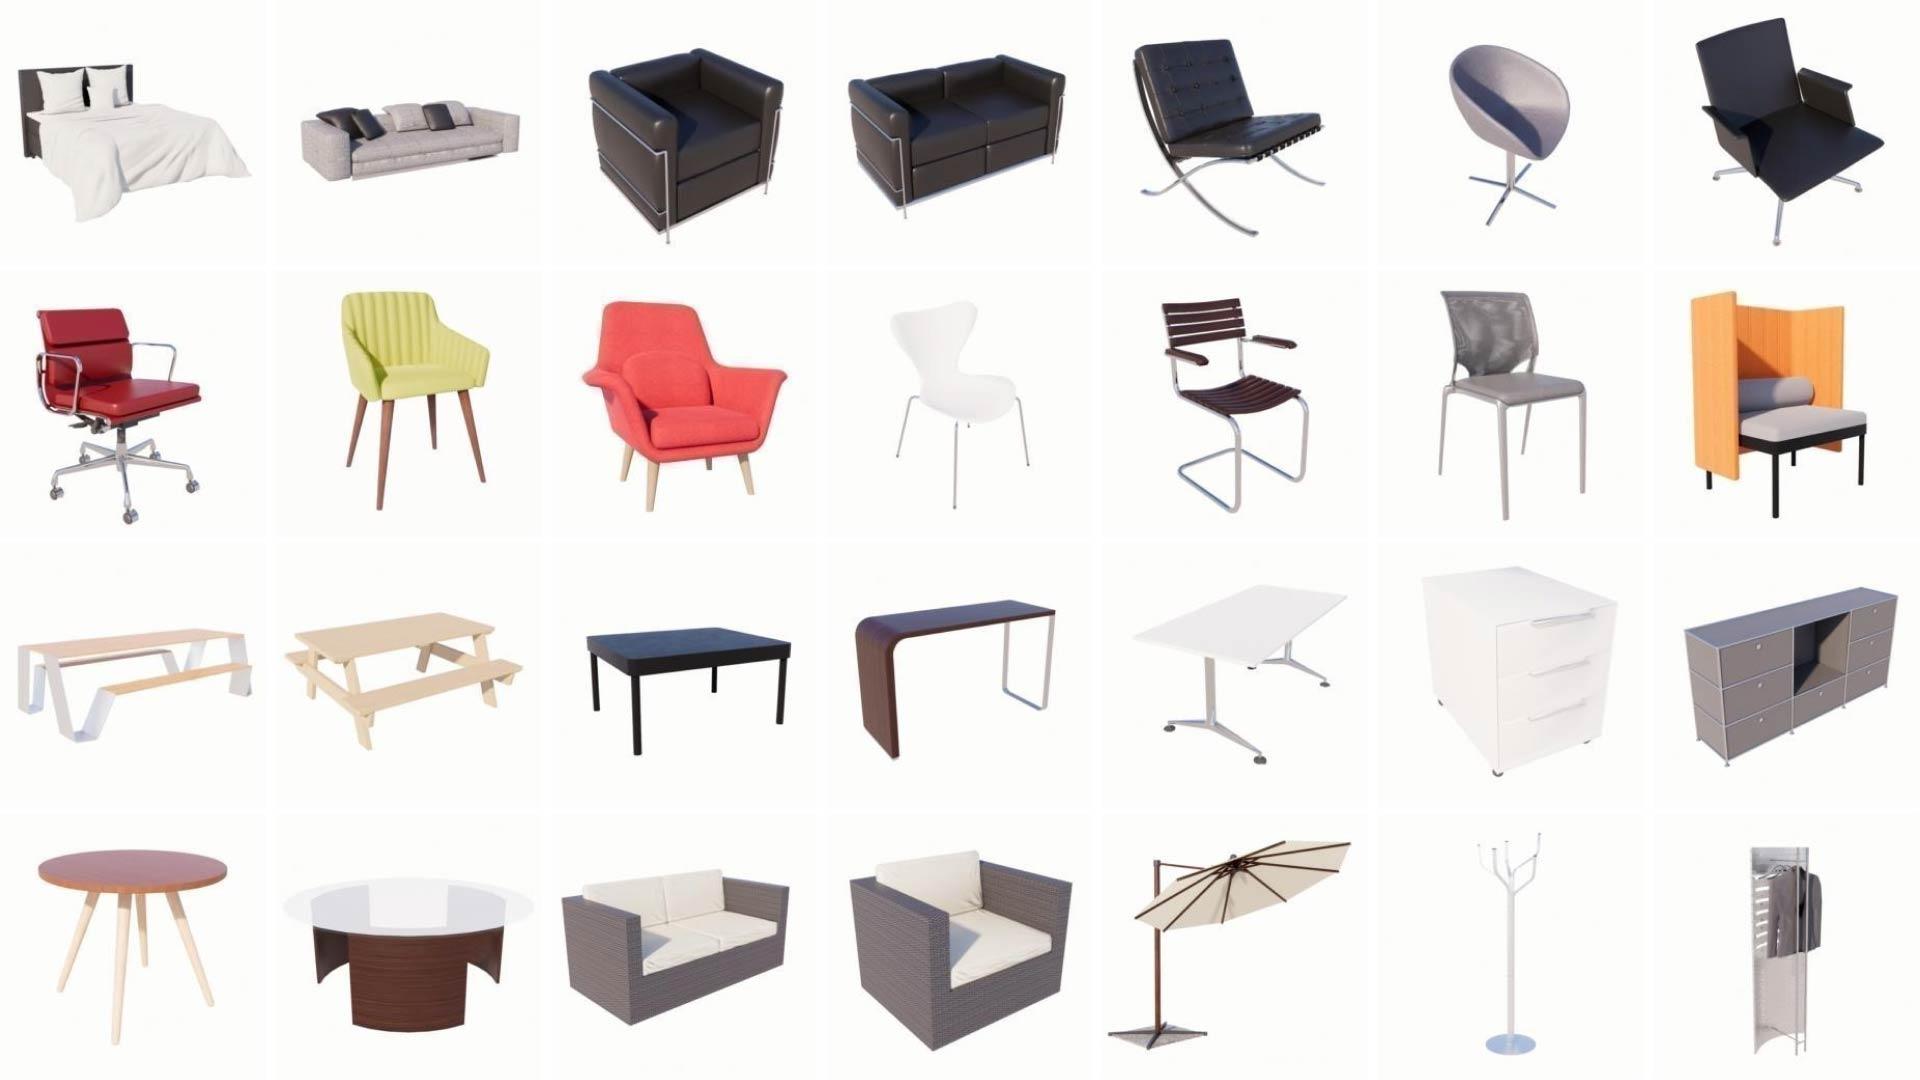 furniture_optimized-1